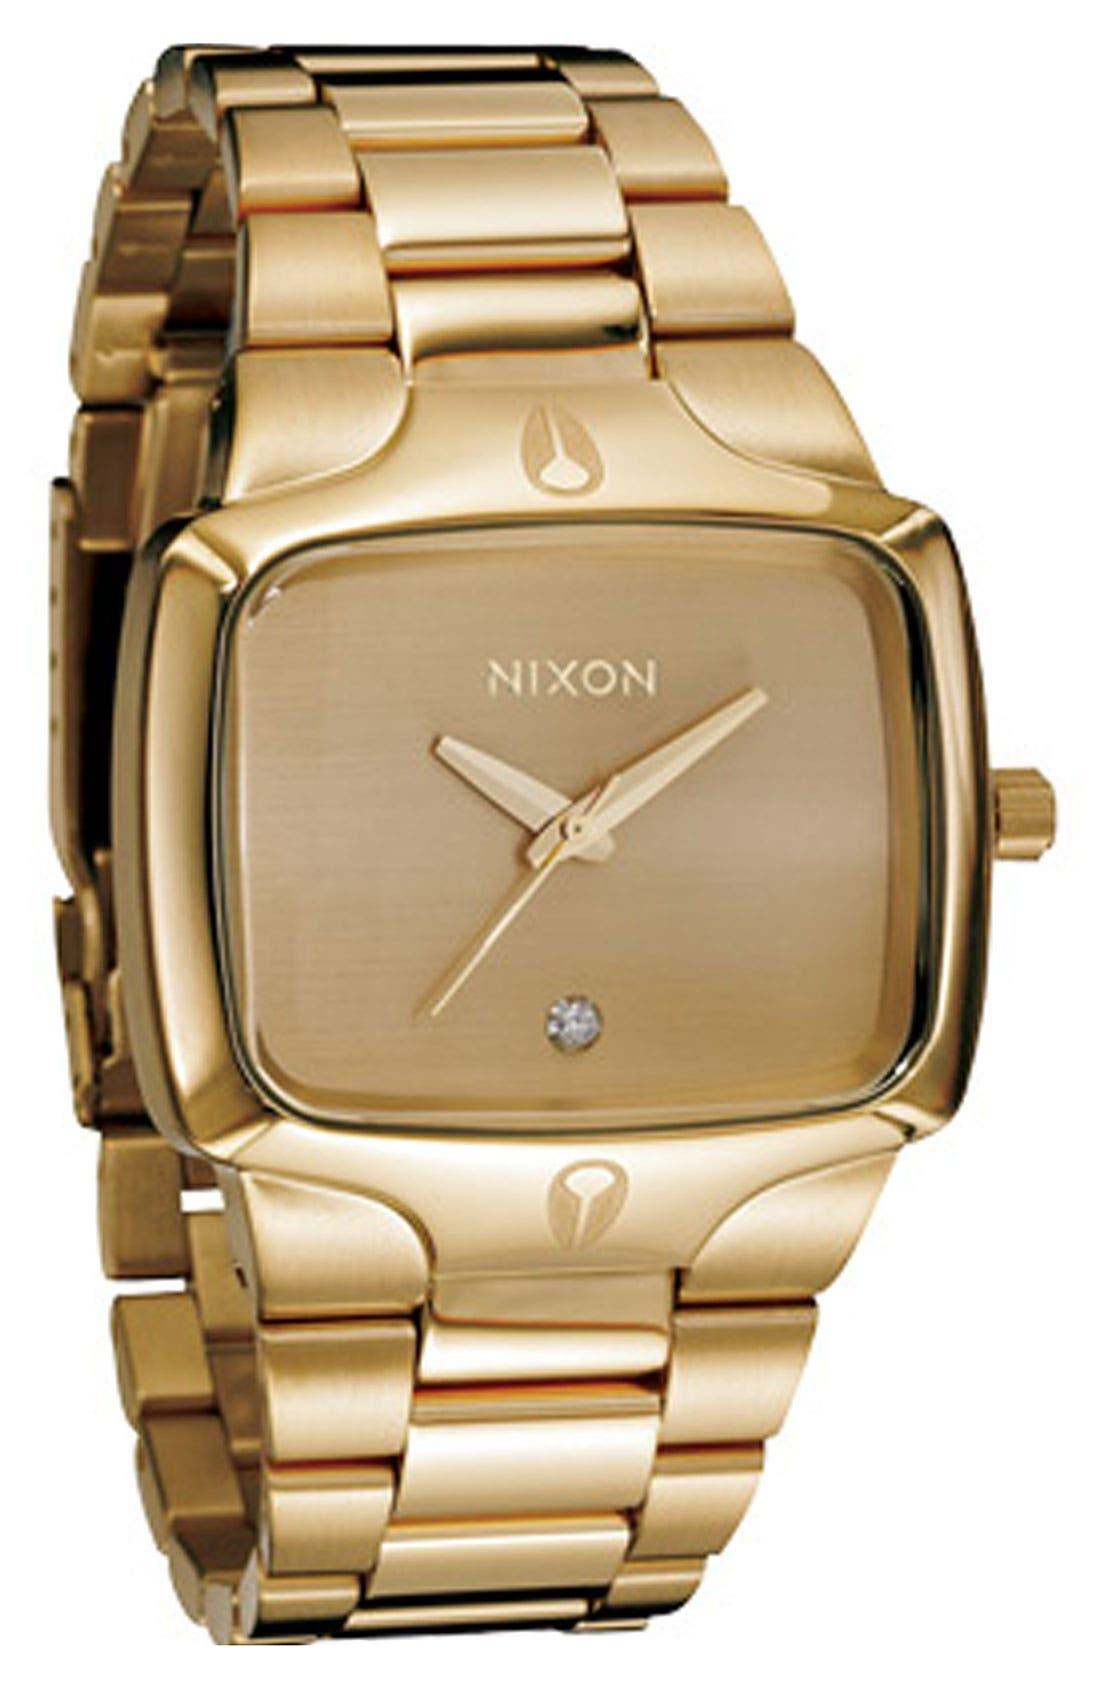 Main Image - Nixon 'The Player' Bracelet Watch, 40mm